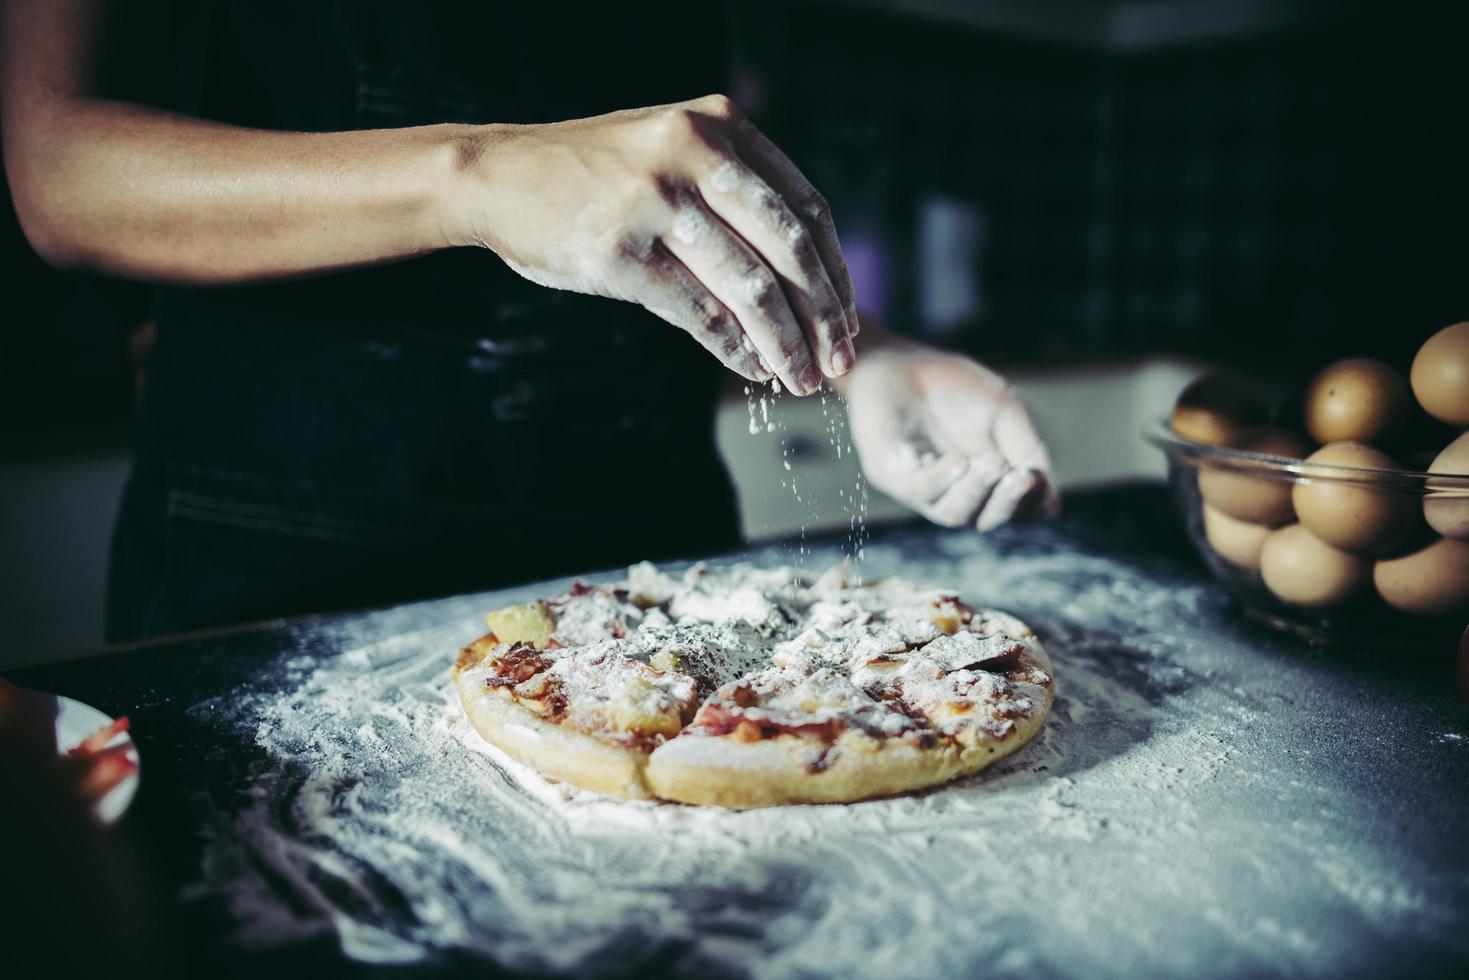 mains du chef, verser la farine sur la pâte crue photo